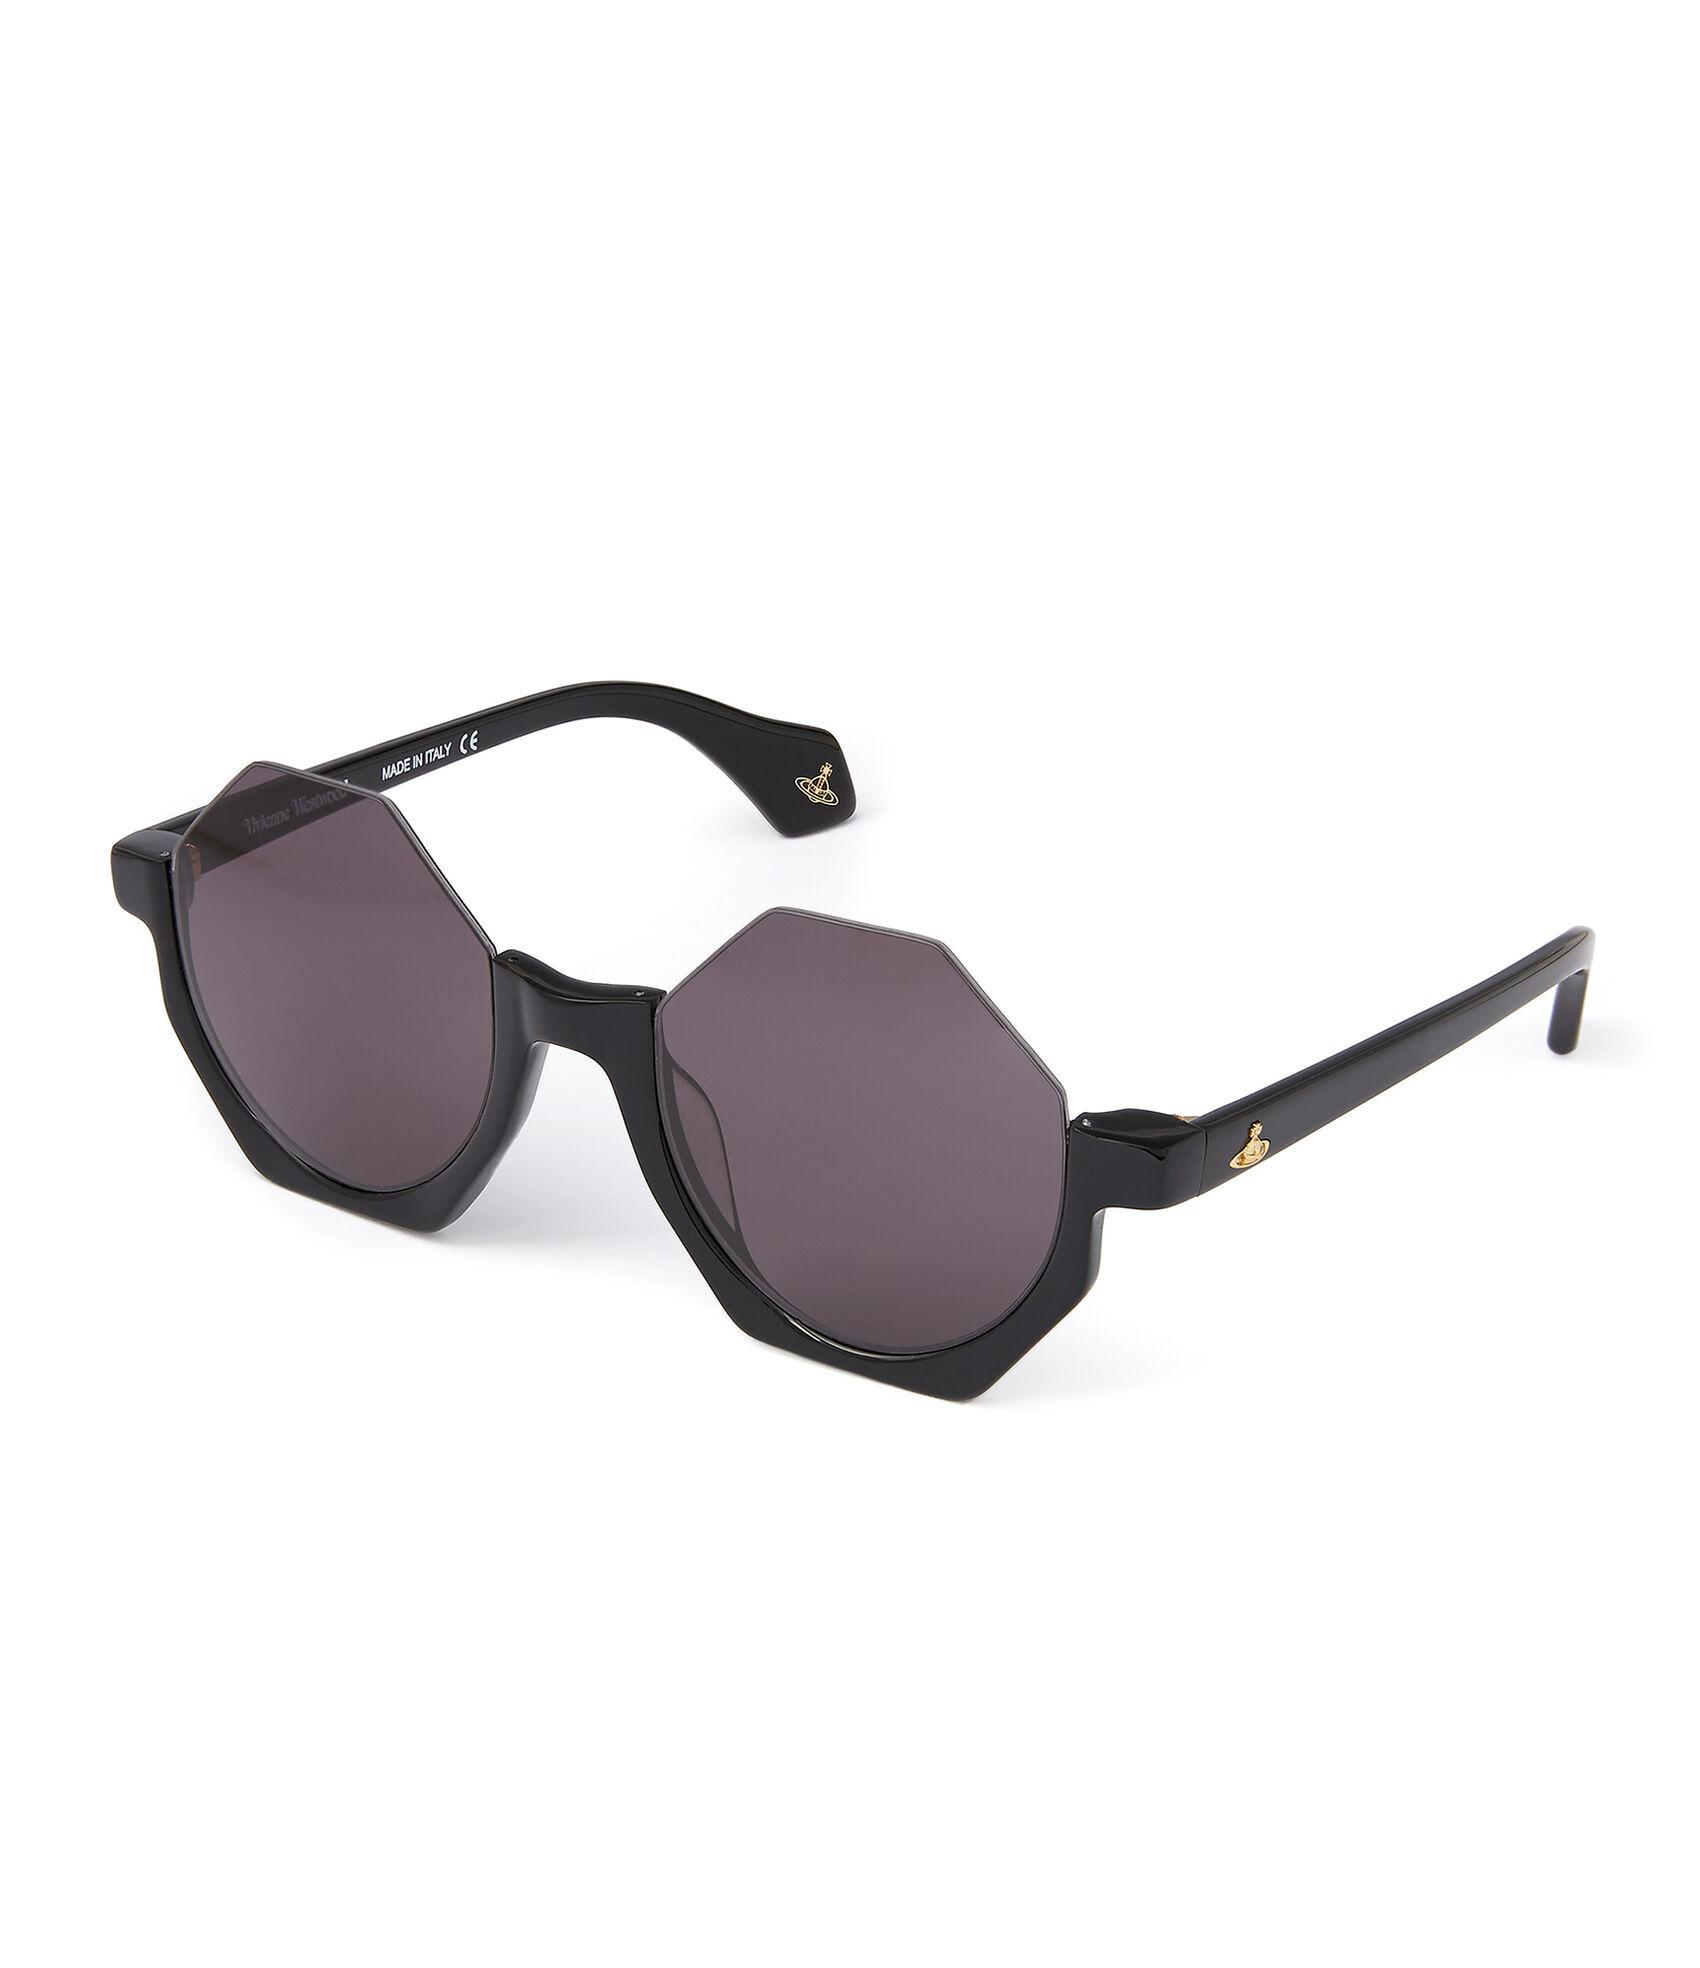 f52296bff01d Vivienne Westwood Women's Designer Sunglasses   Vivienne ...